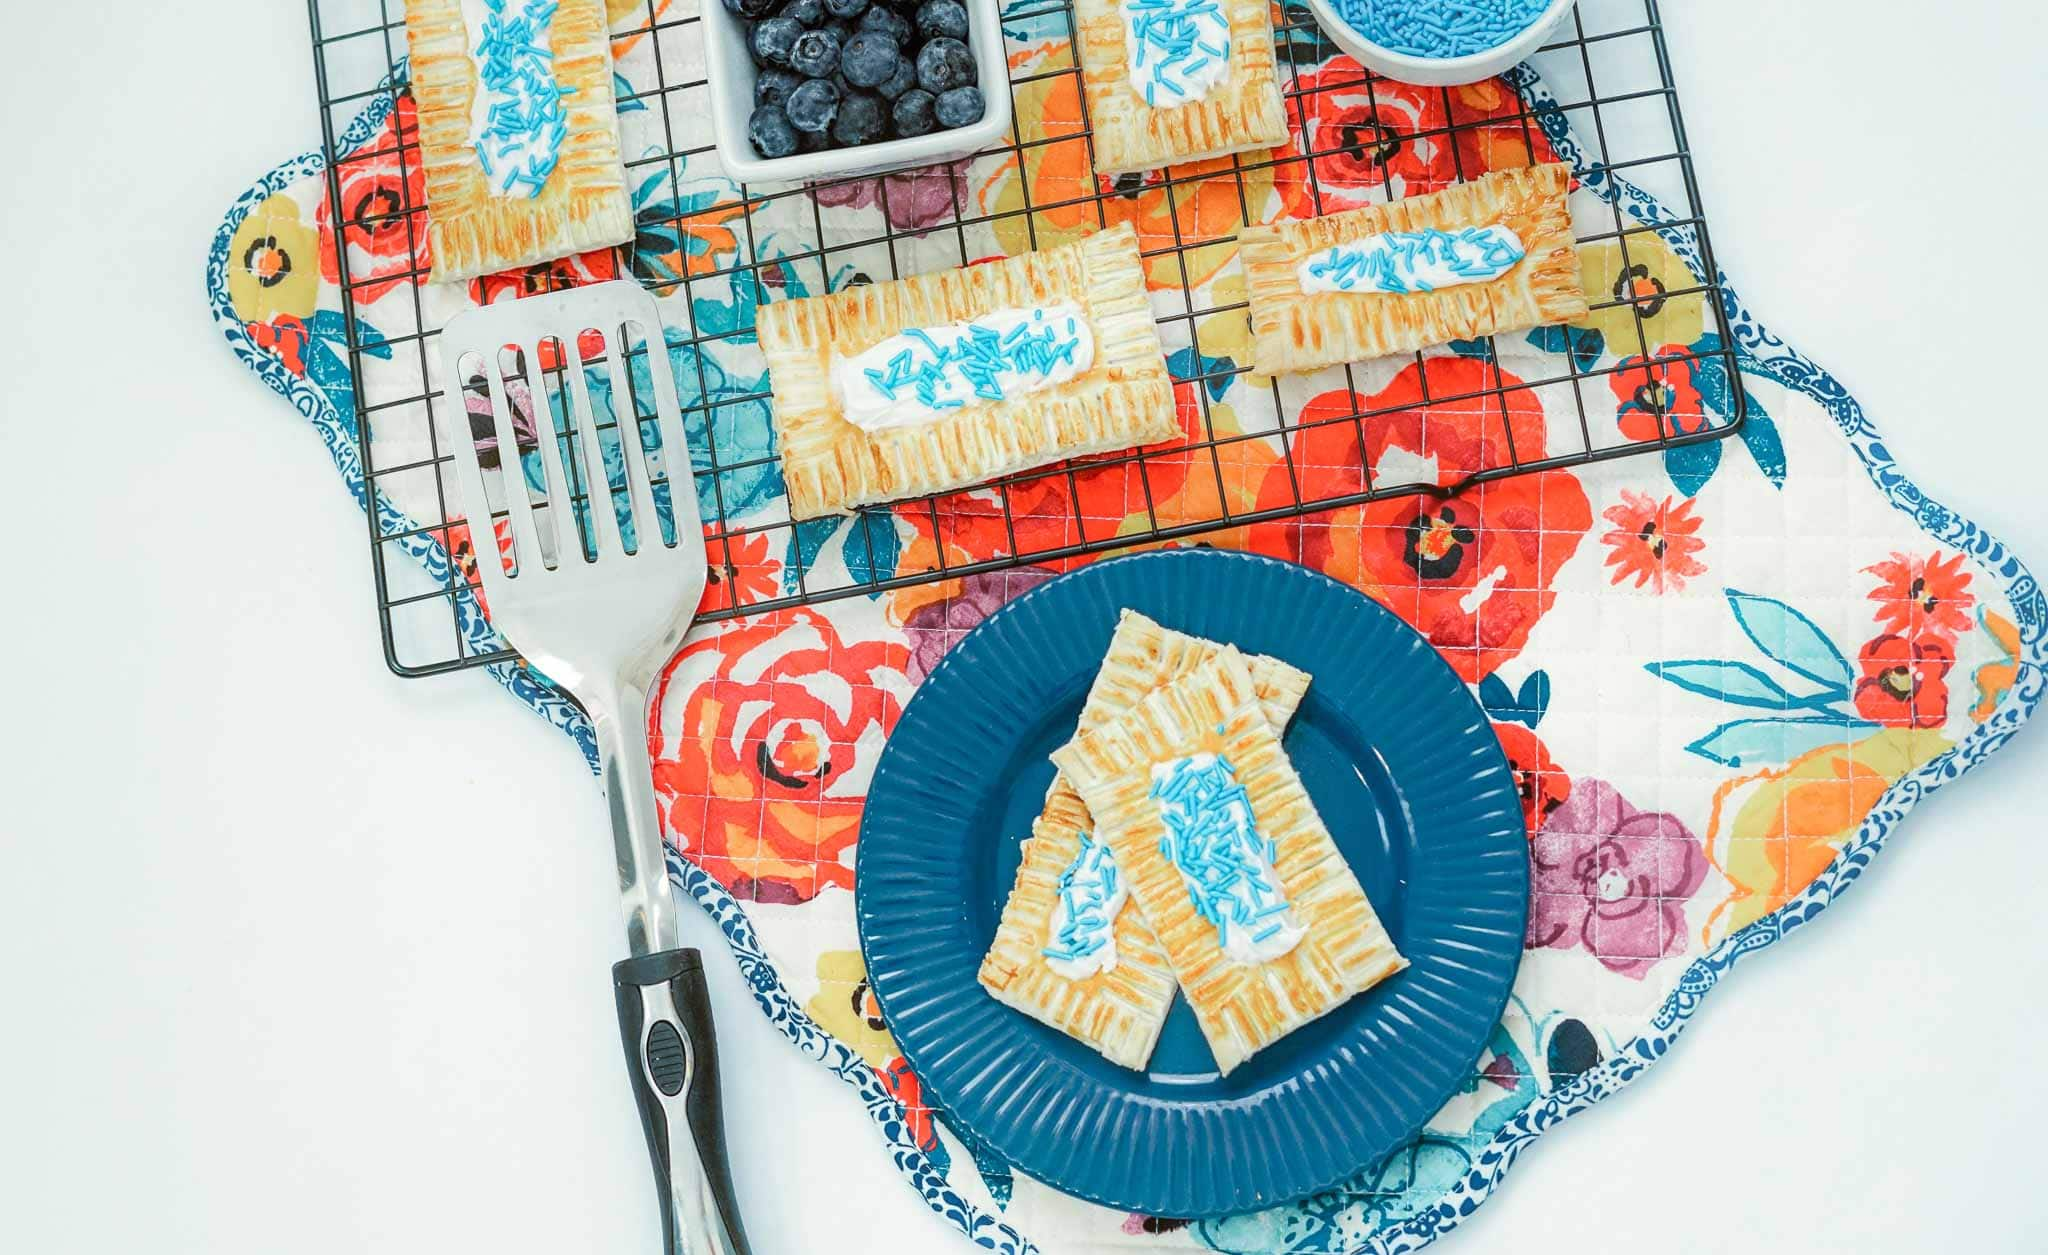 Air-Fryer-Blueberry-Pop-tarts